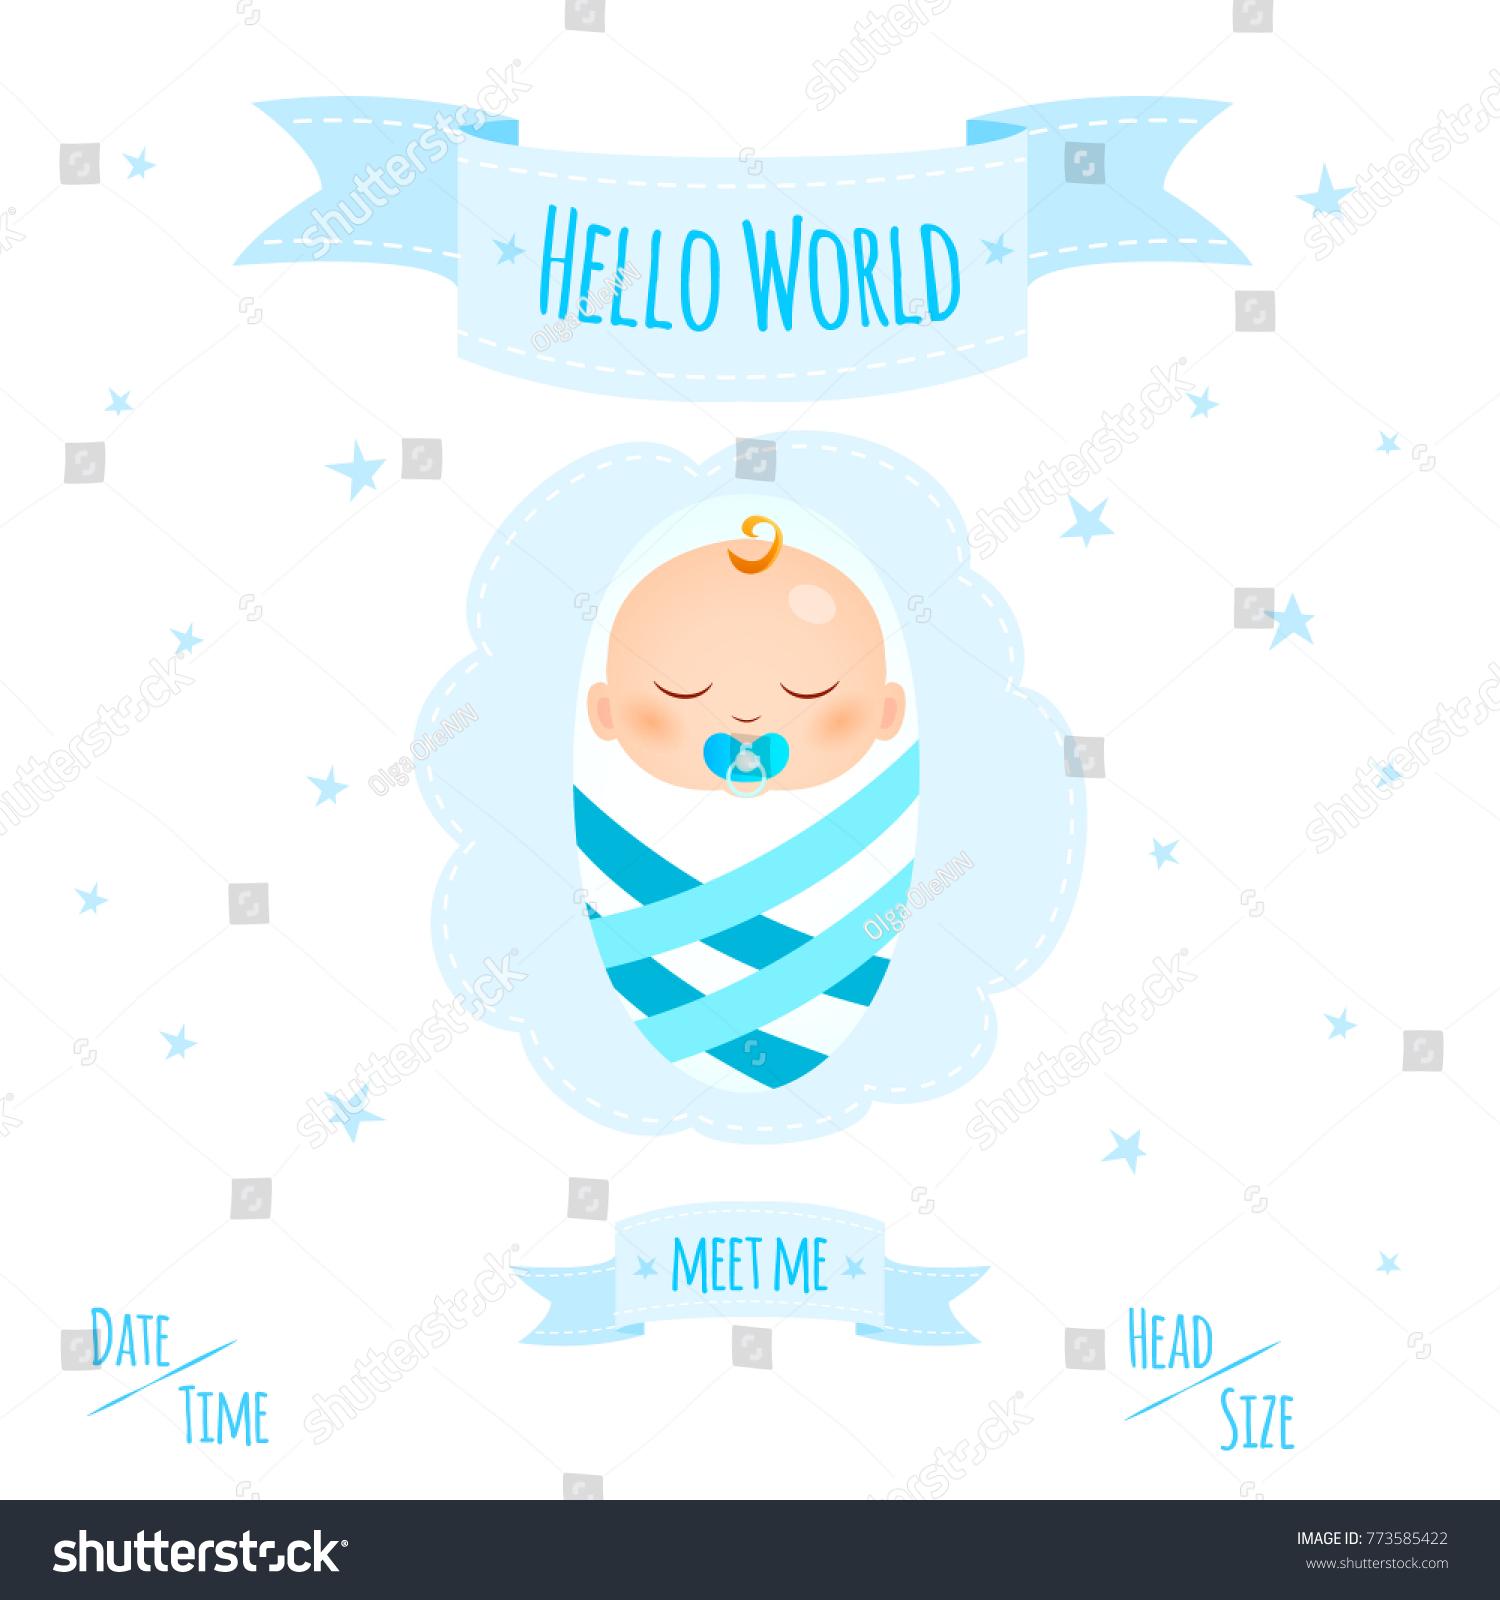 New Child Born Baby Newborn Greeting Stock Illustration 773585422